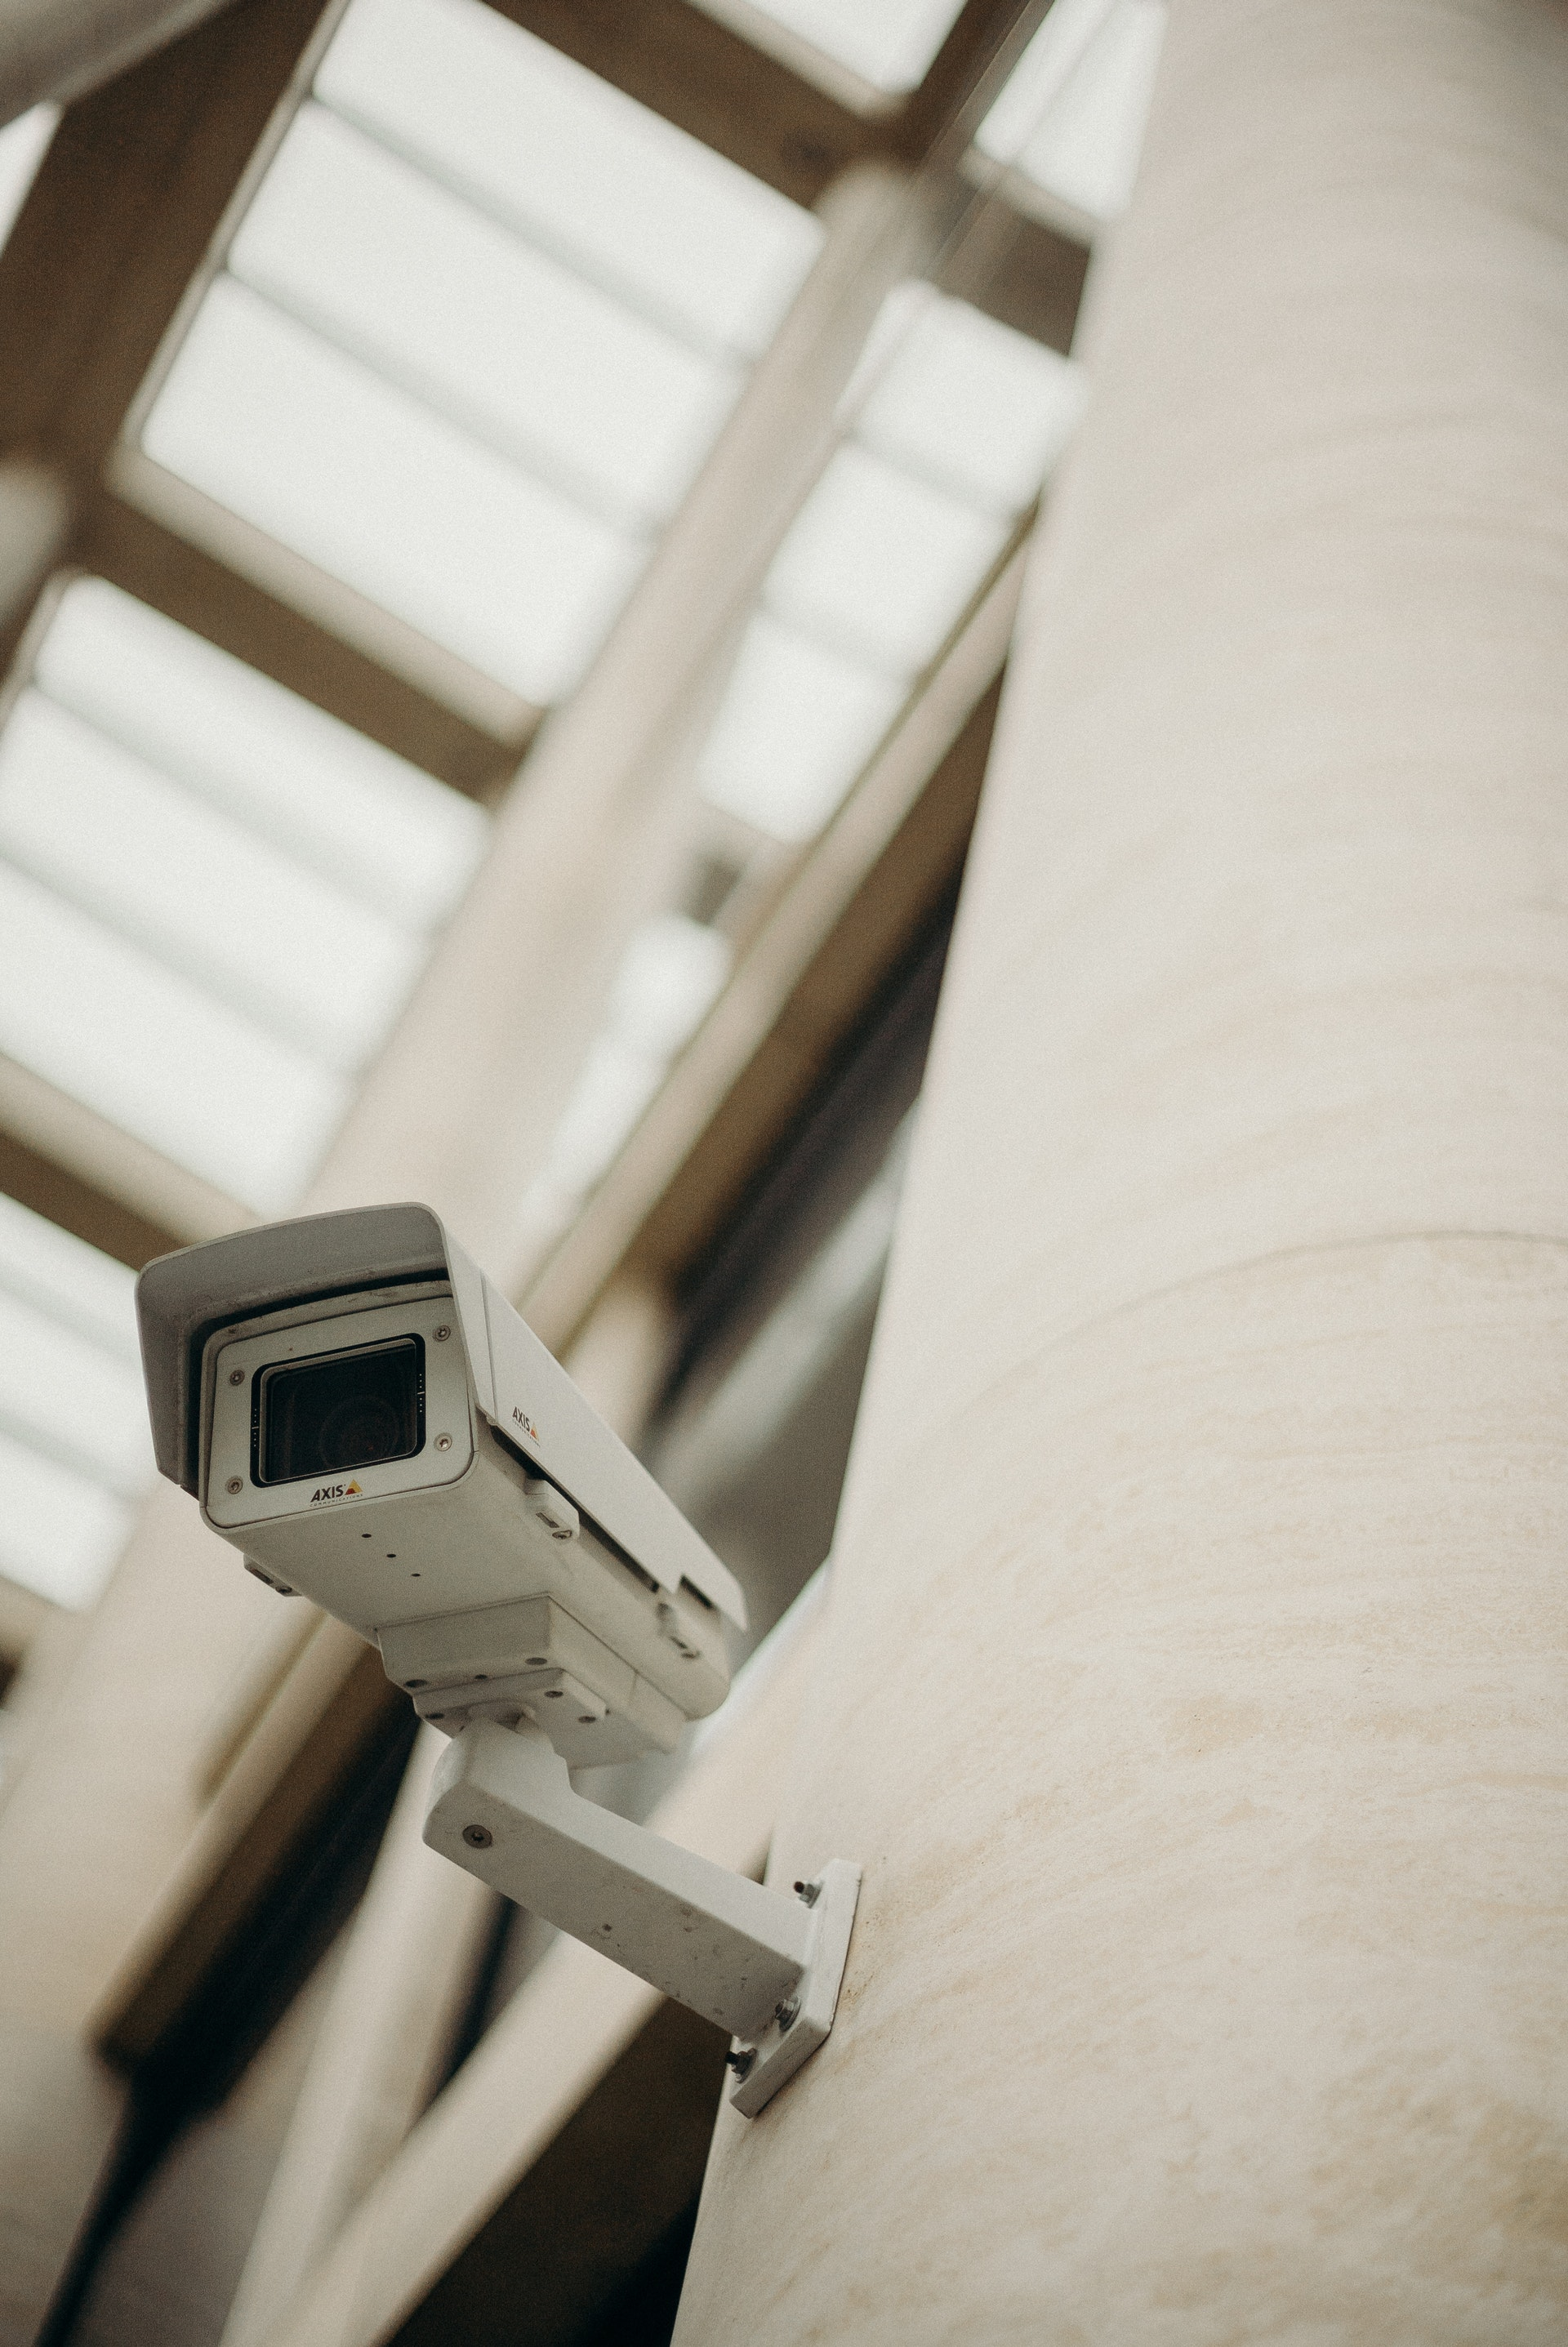 prix des caméras espion 1